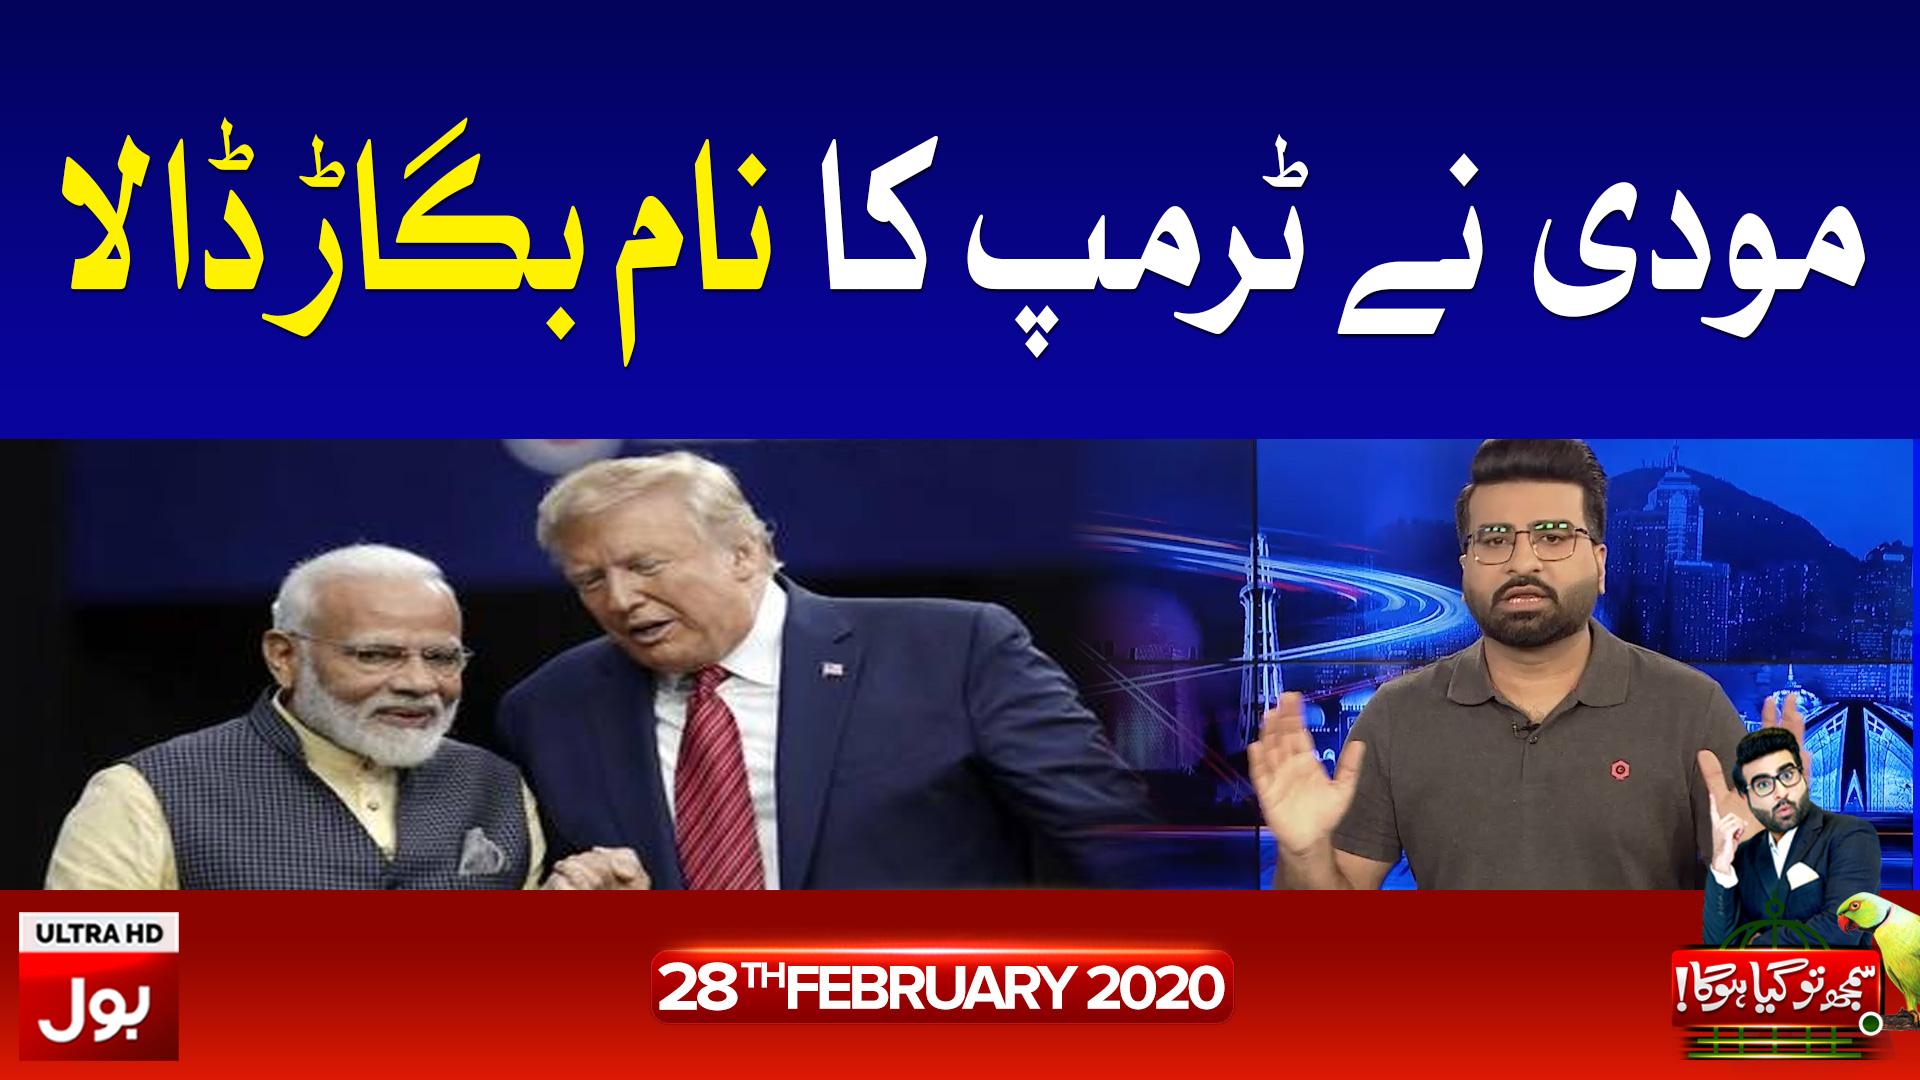 Samajh Tou Gaya Hoga Comedy Show Full Episode | 29 Feb 2020 | BOL News